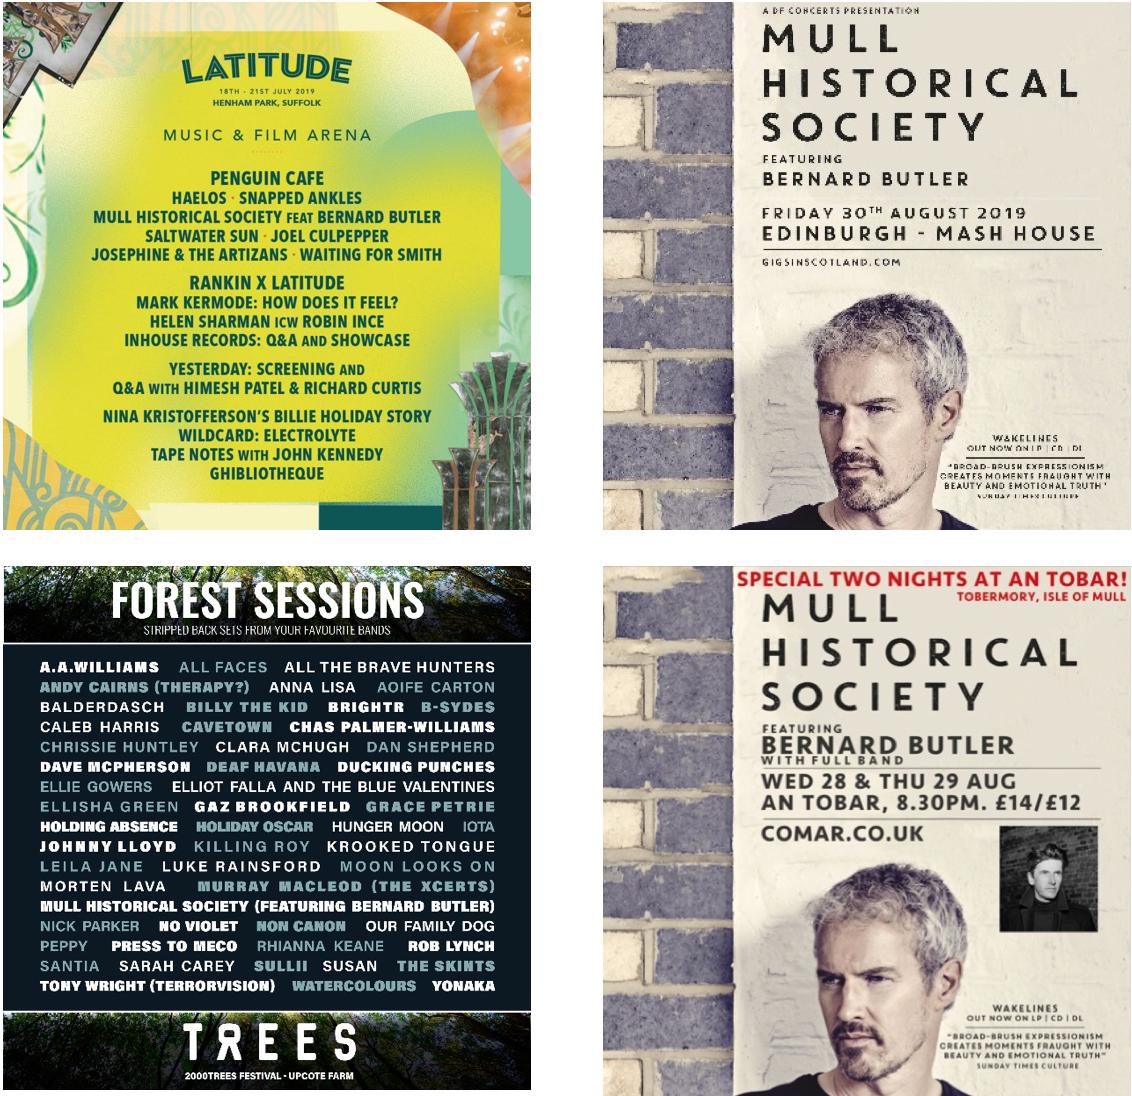 MULL HISTORICAL SOCIETY SUMMER with guest BERNARD BUTLER: LATITUDE FESTIVAL / 2000 TREES FESTIVAL/ EDINBURGH / ISLE OF MULL HOMECOMING